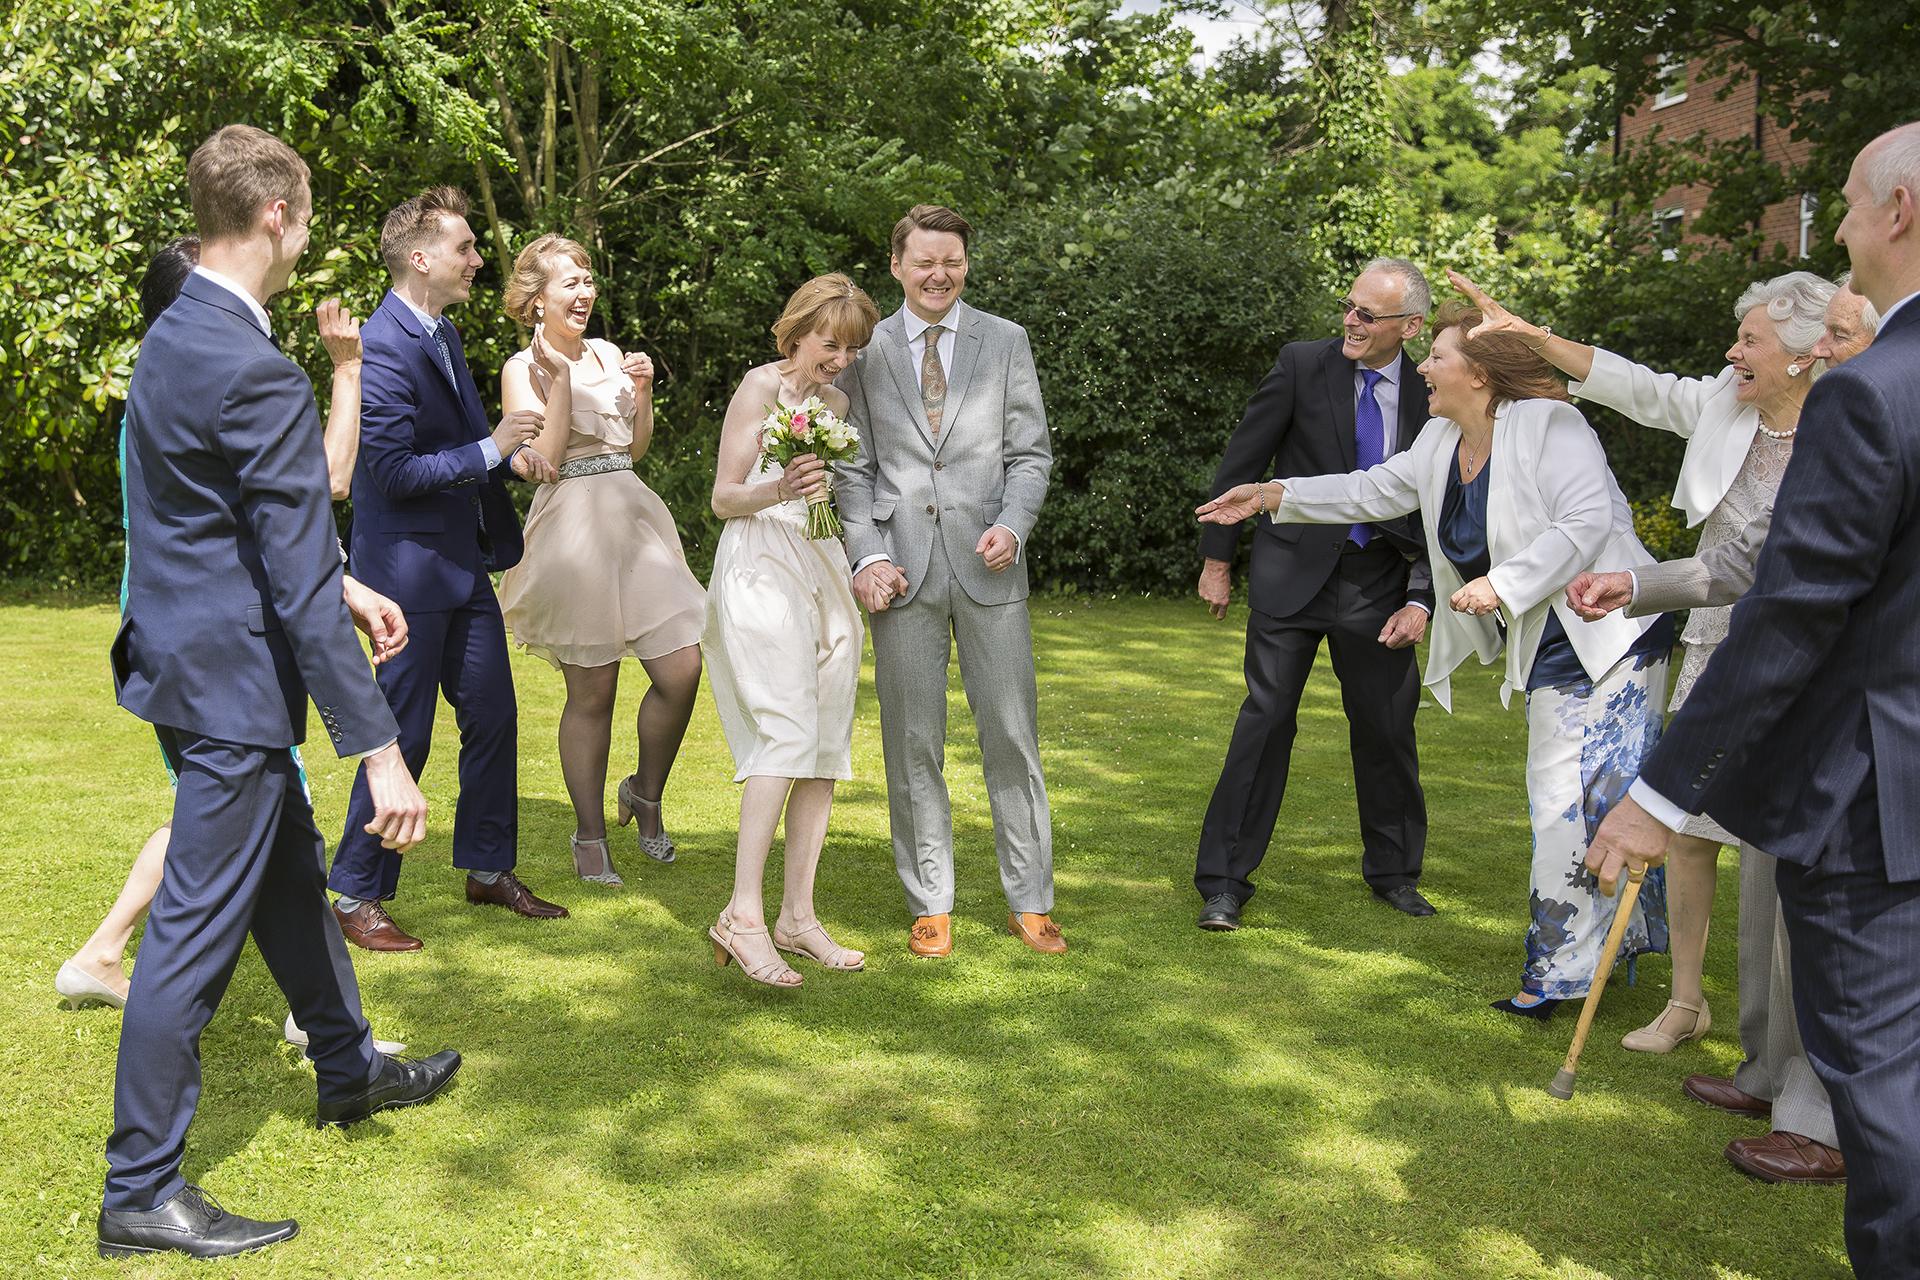 Emma and Elliot English : Wedding June 2016